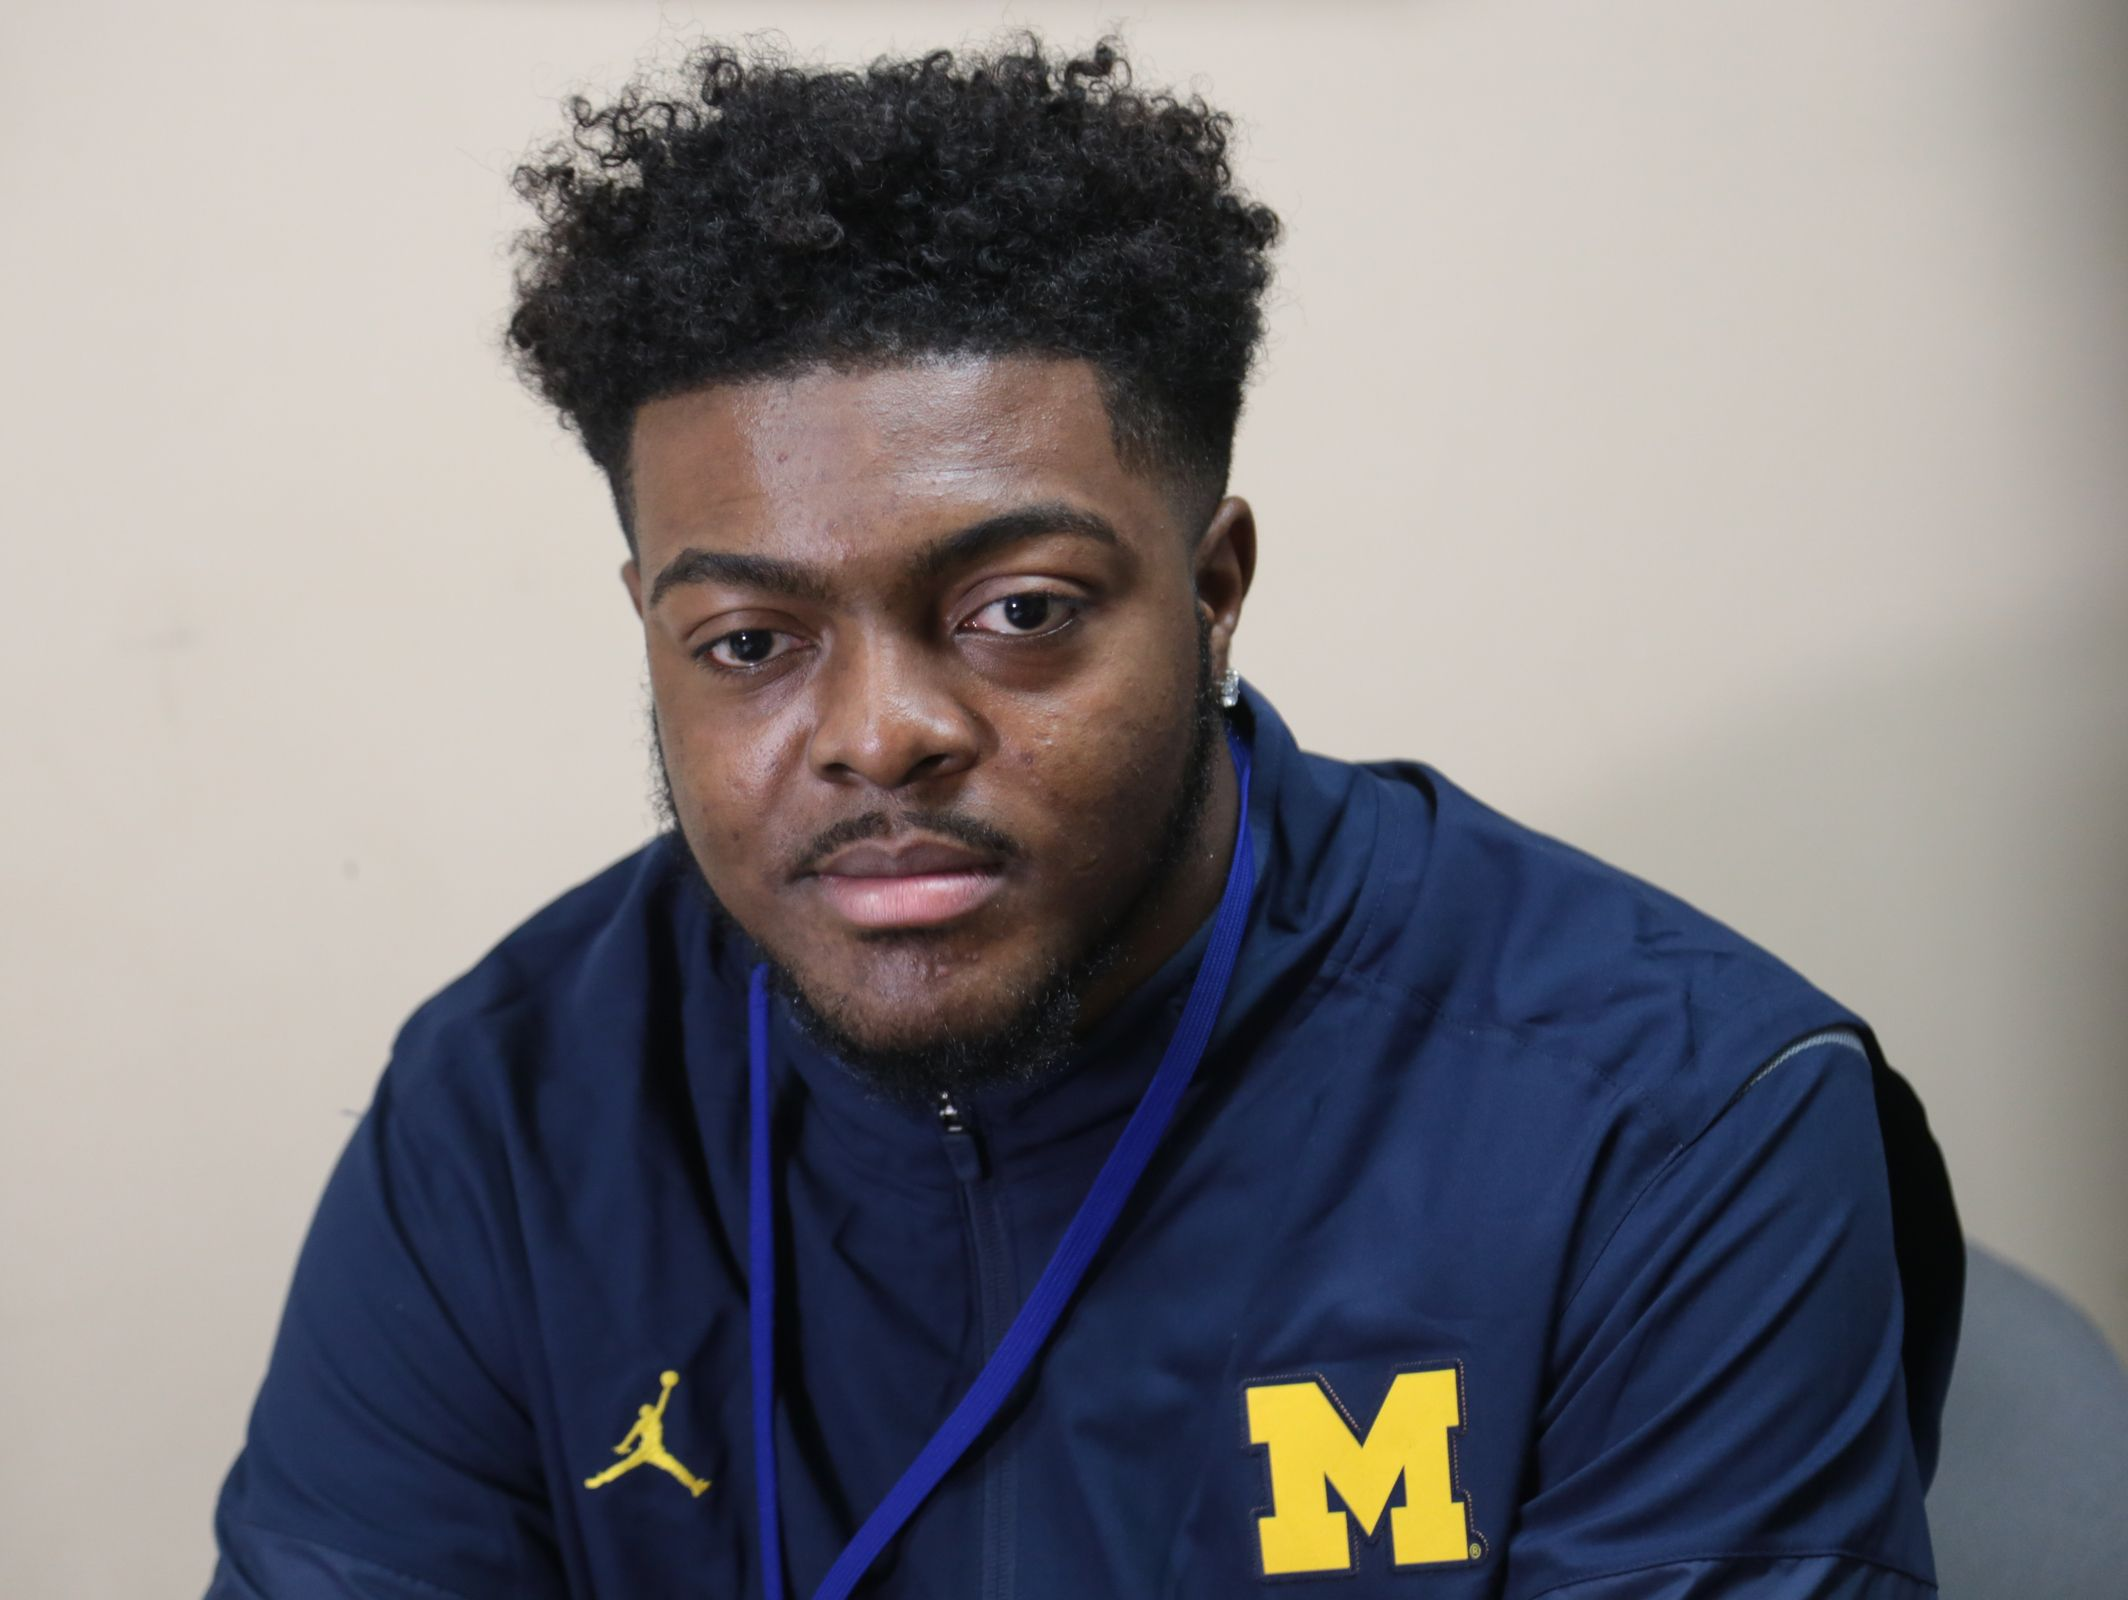 Flint Southwestern football player Deron Irving Bey talks about heading to play football at University of Michigan next season on Friday January 20, 2017 at Flint Carman-Ainsworth High School.